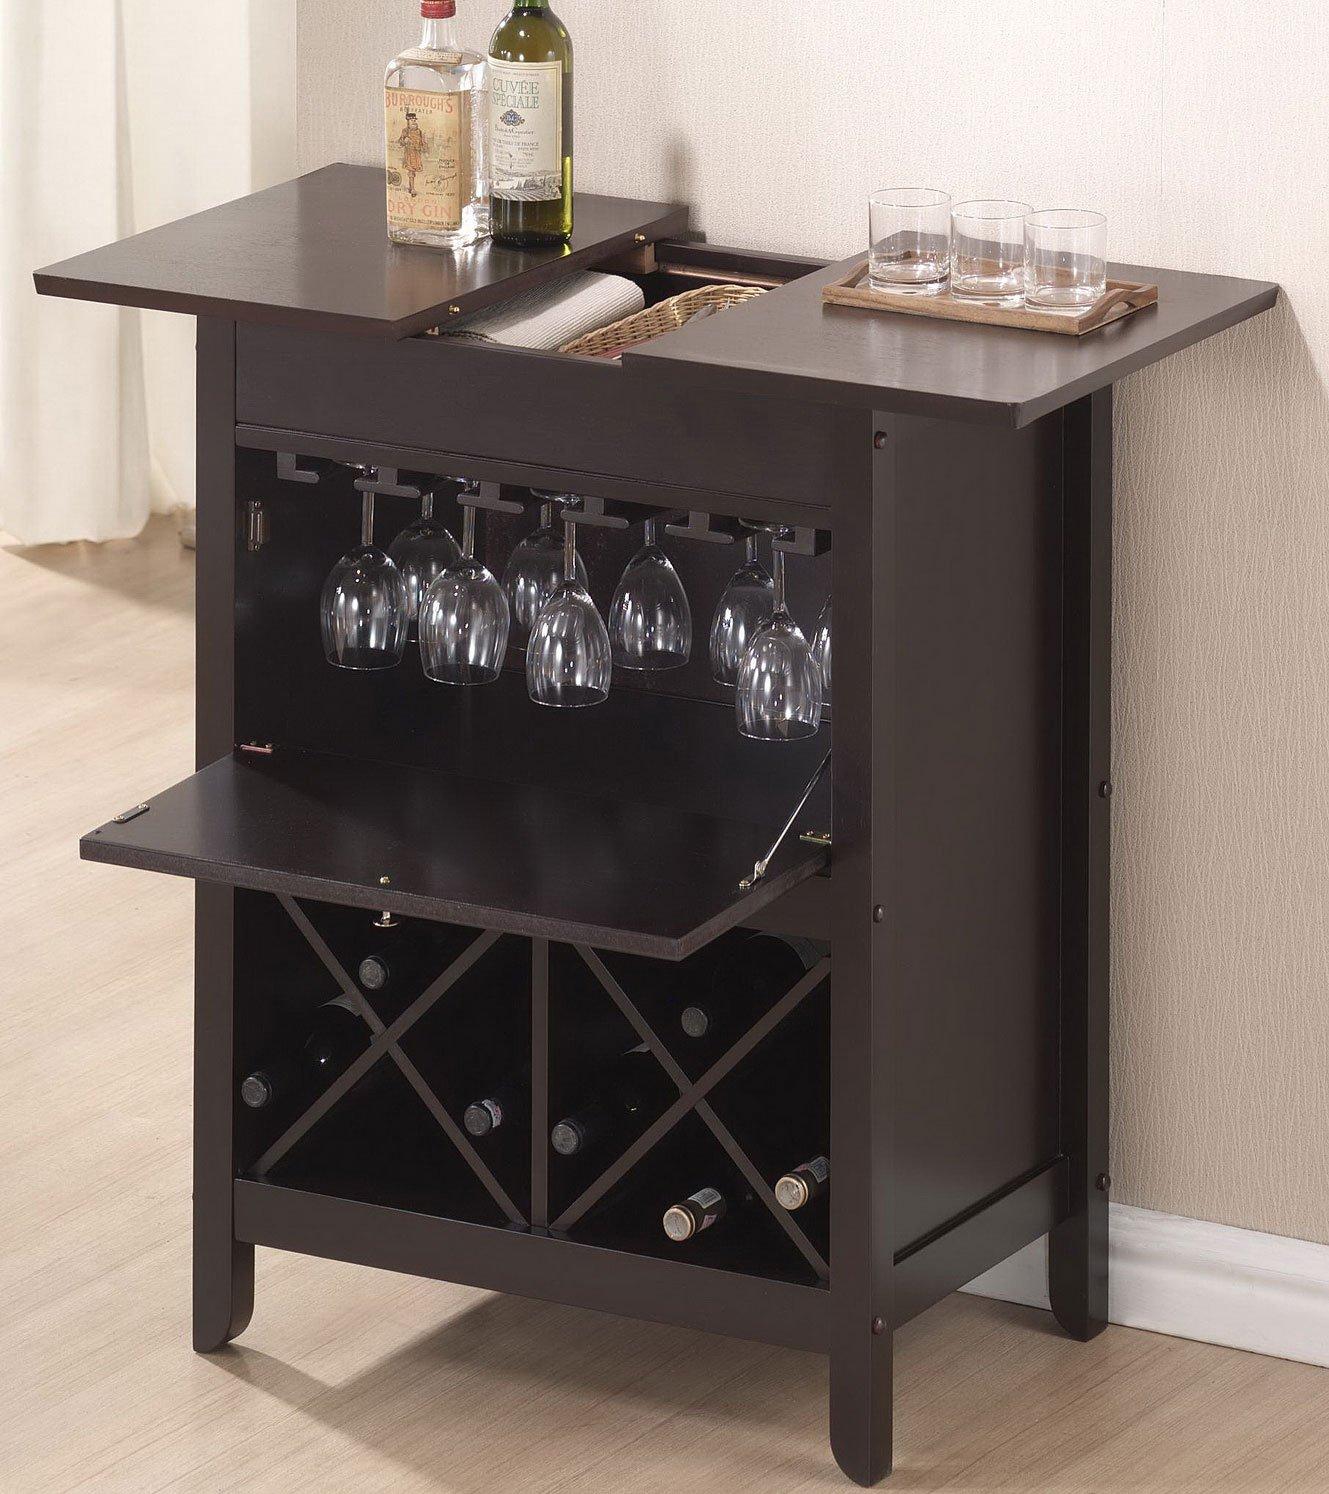 modern wine rack furniture amazoncom baxton studio tuscany brown modern dry bar and wine cabinet